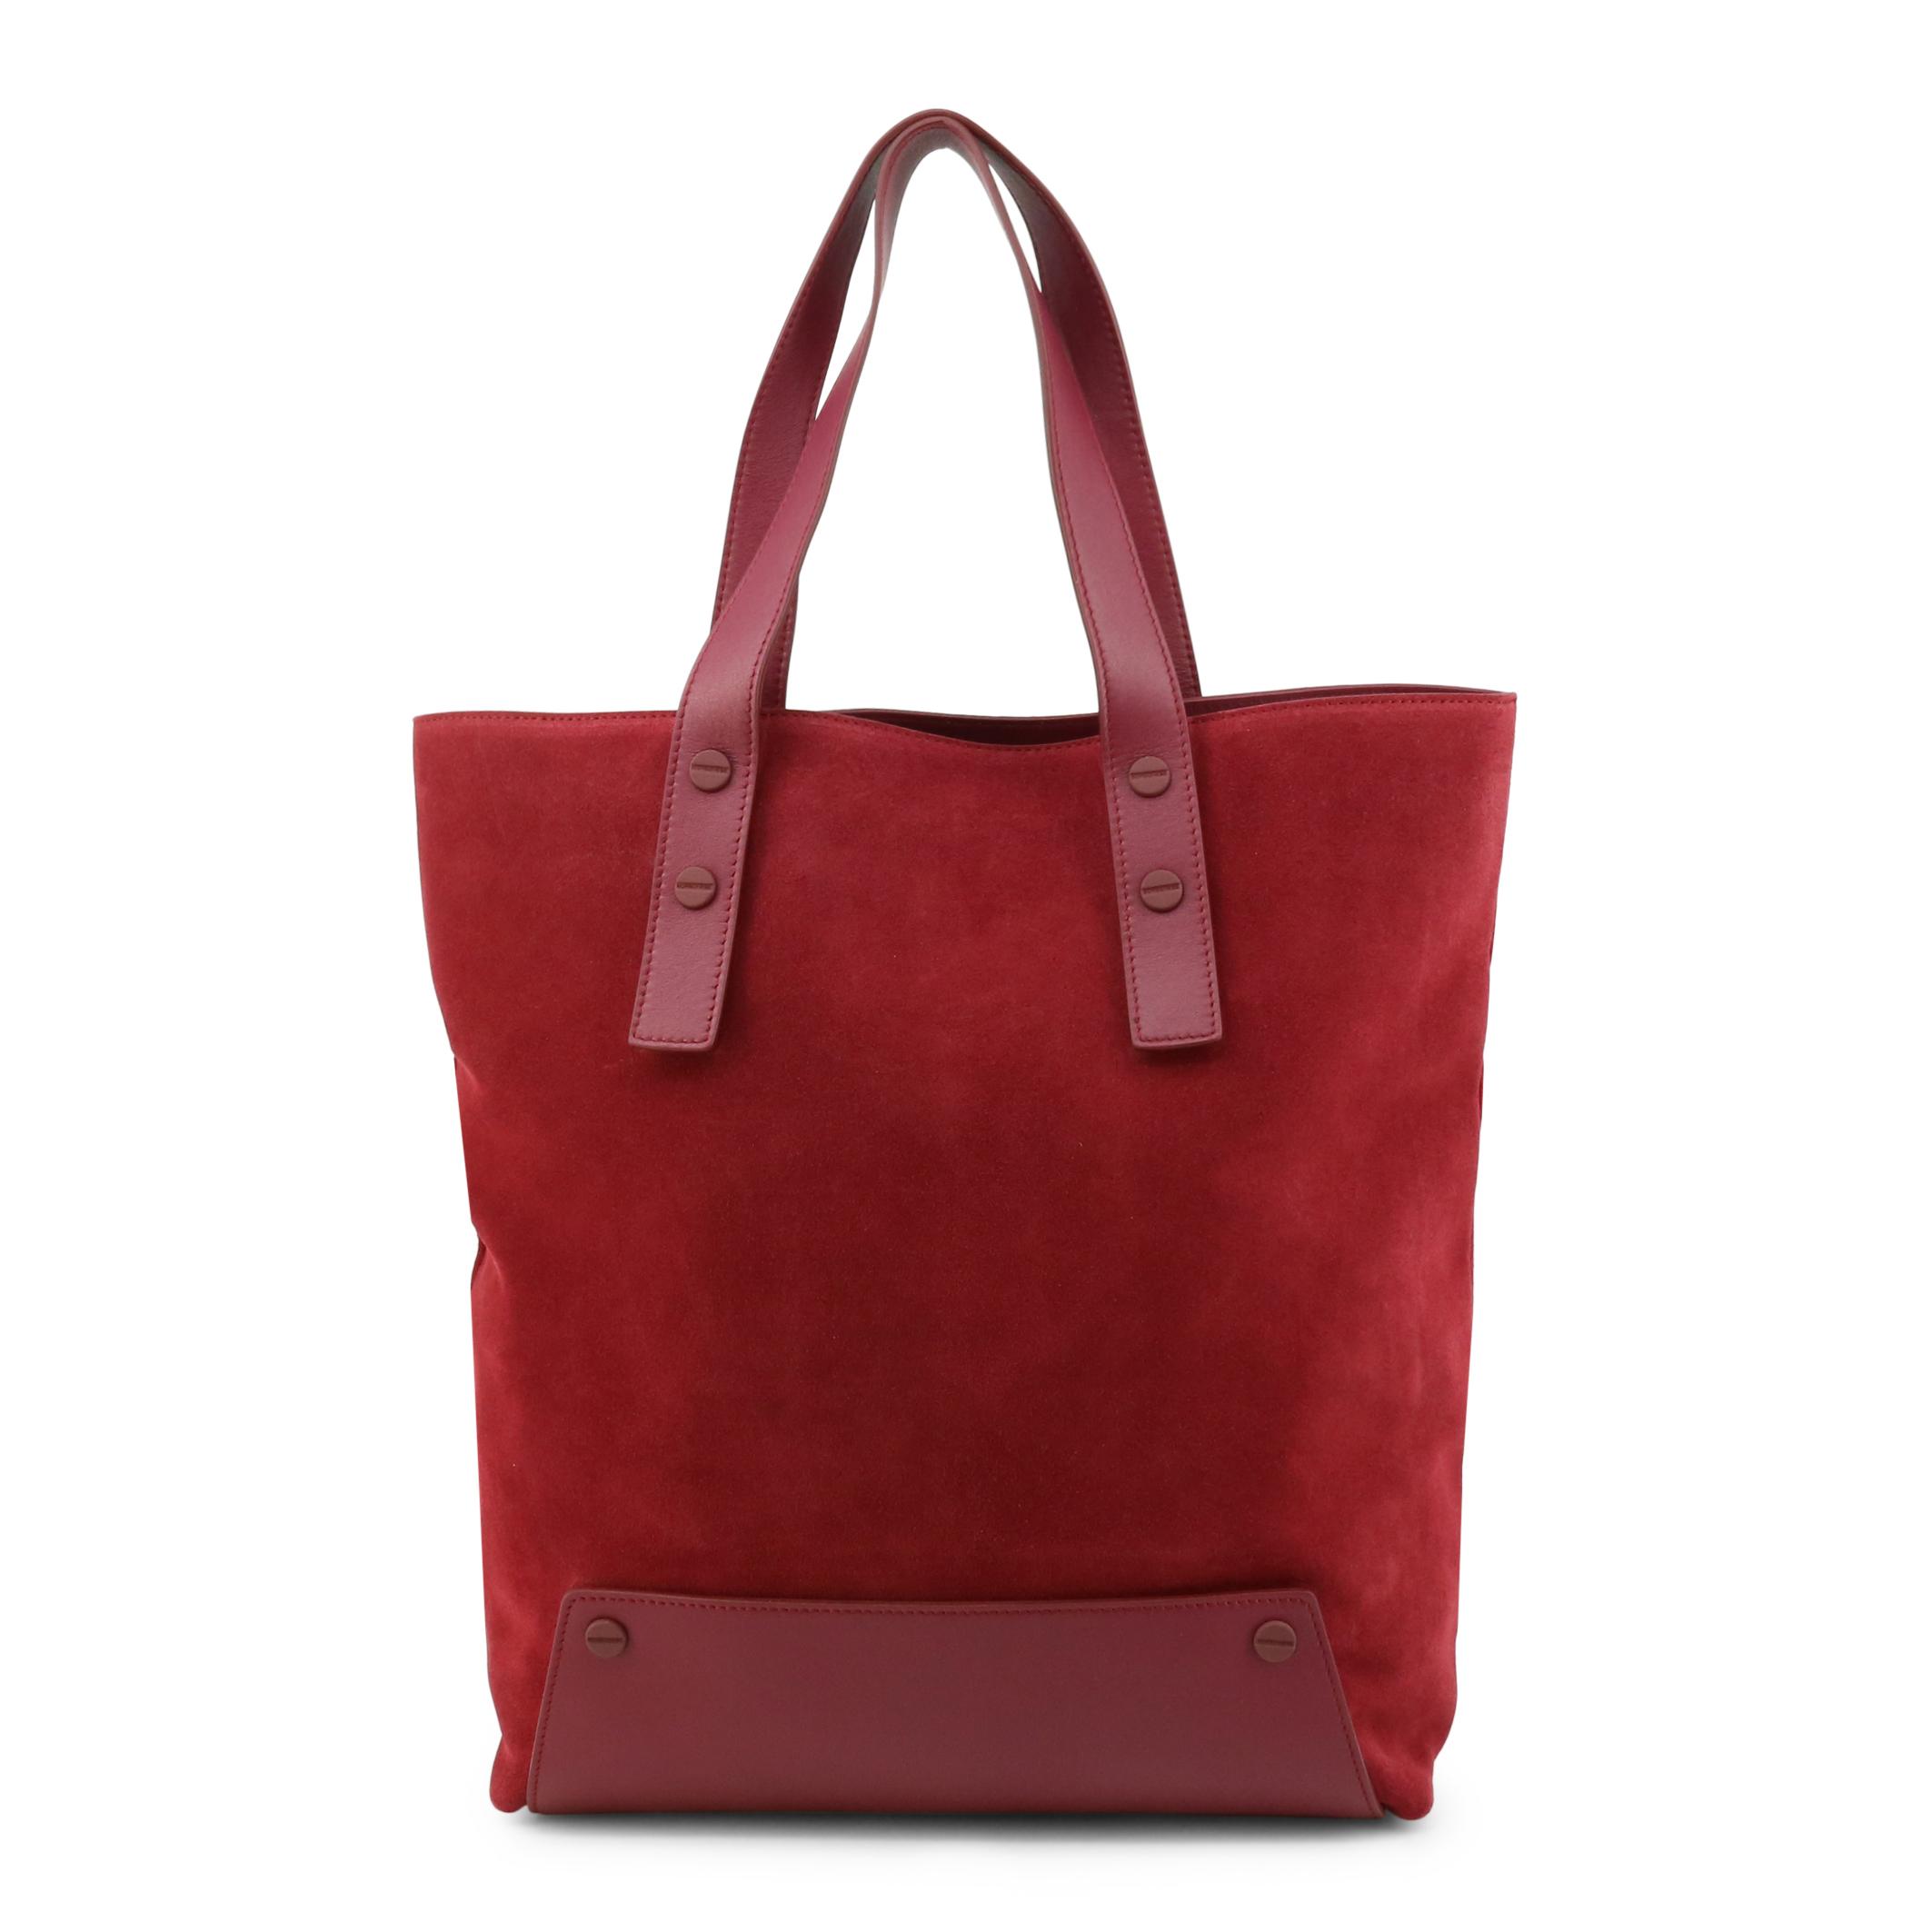 Borbonese - 954131-F04 - Red